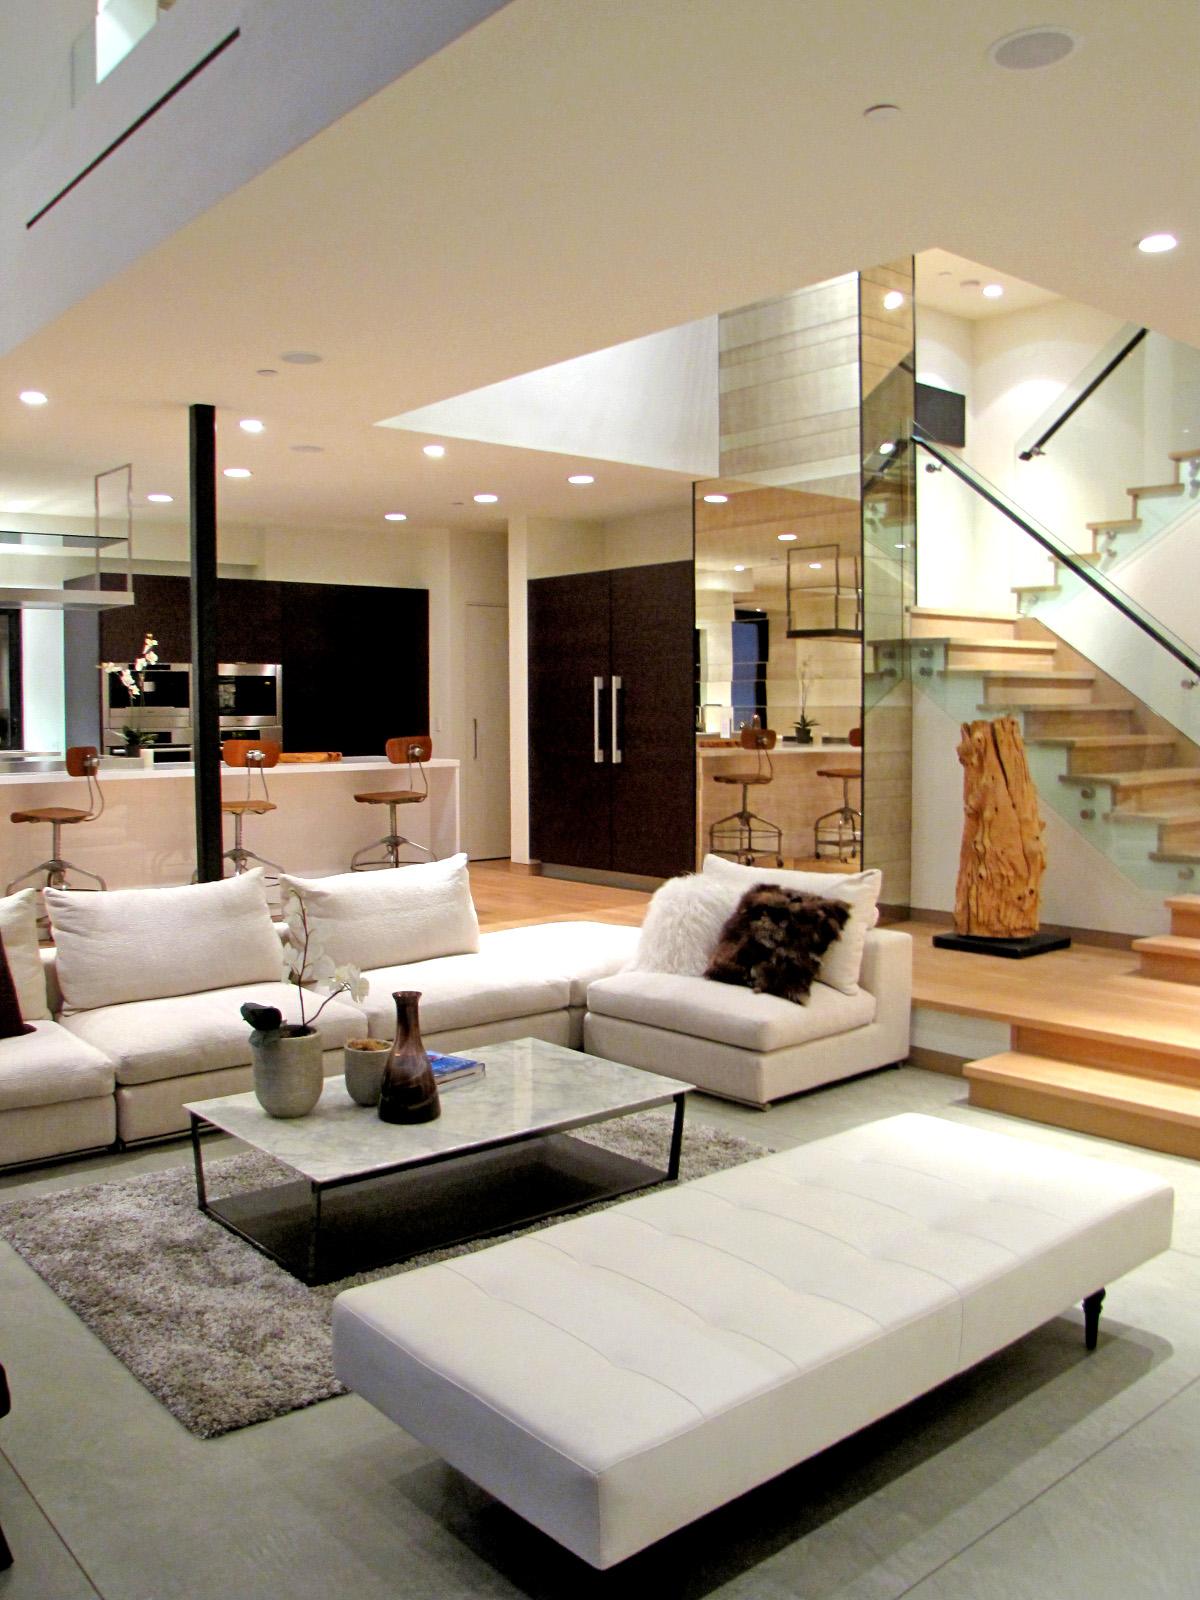 Heaven 39 s walk decoracion salas livingroom wohzimmer for Salas modernas